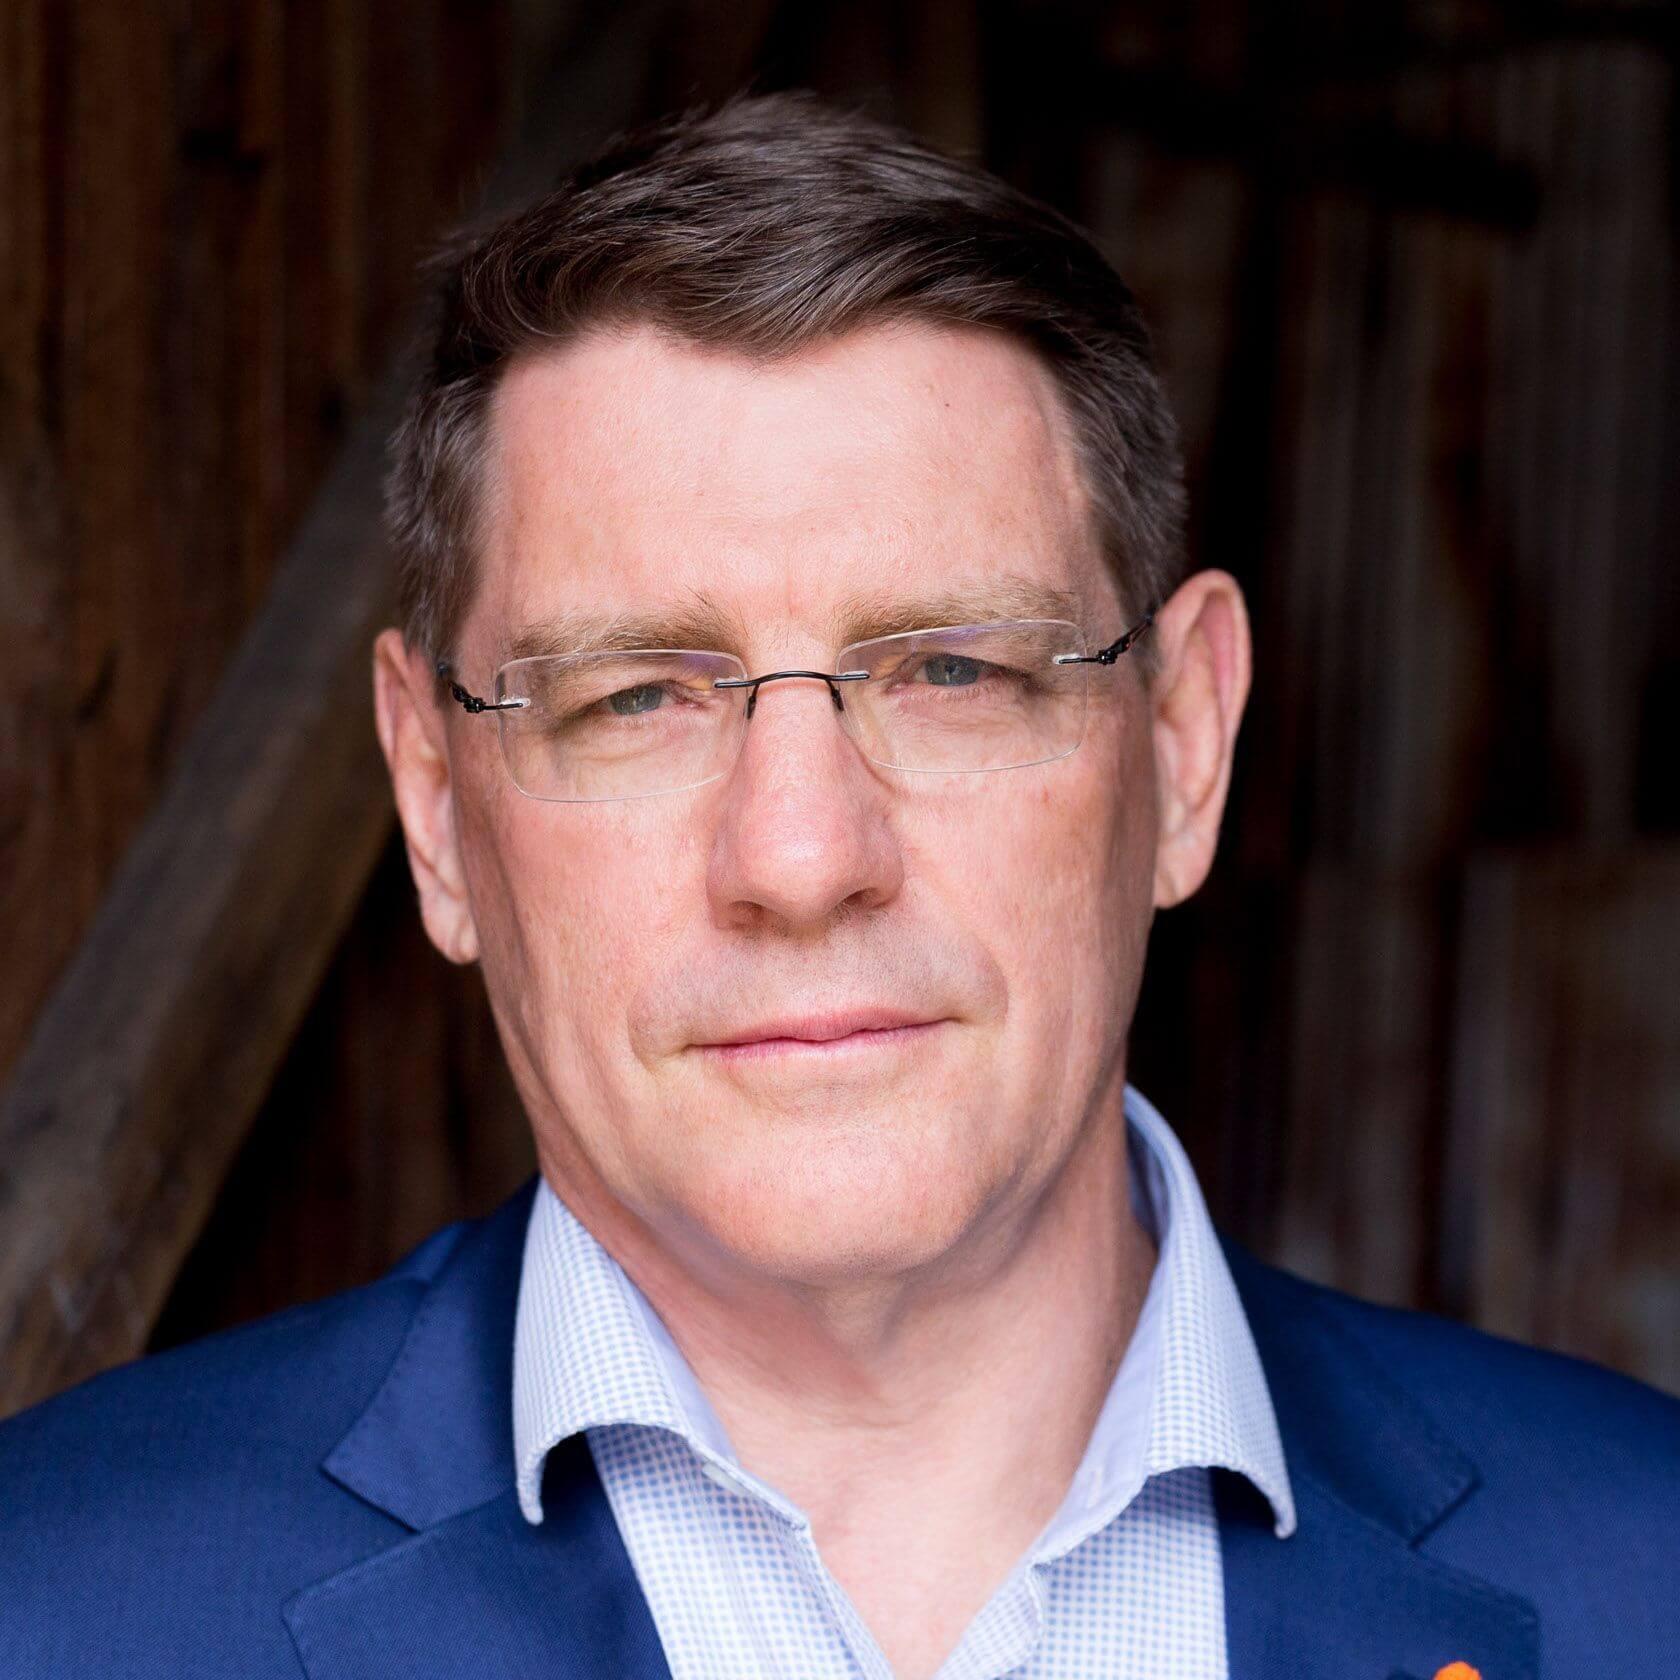 Russell Cummings